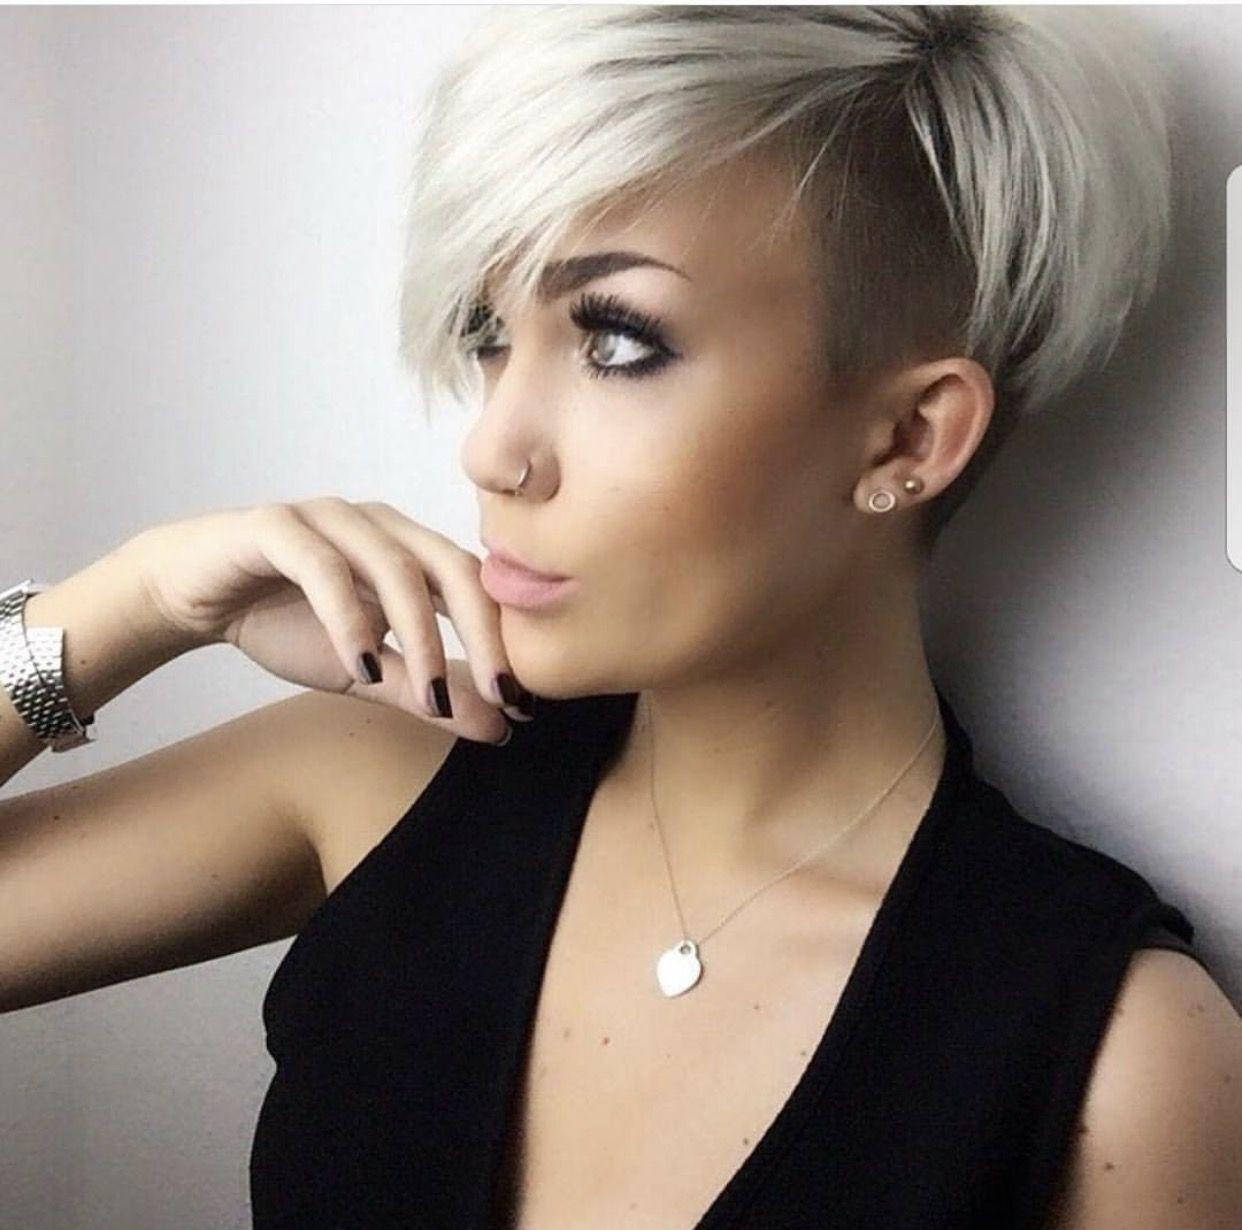 Pin By Bkm On Hair Short Hair Styles Short Hair With Bangs Undercut Hairstyles